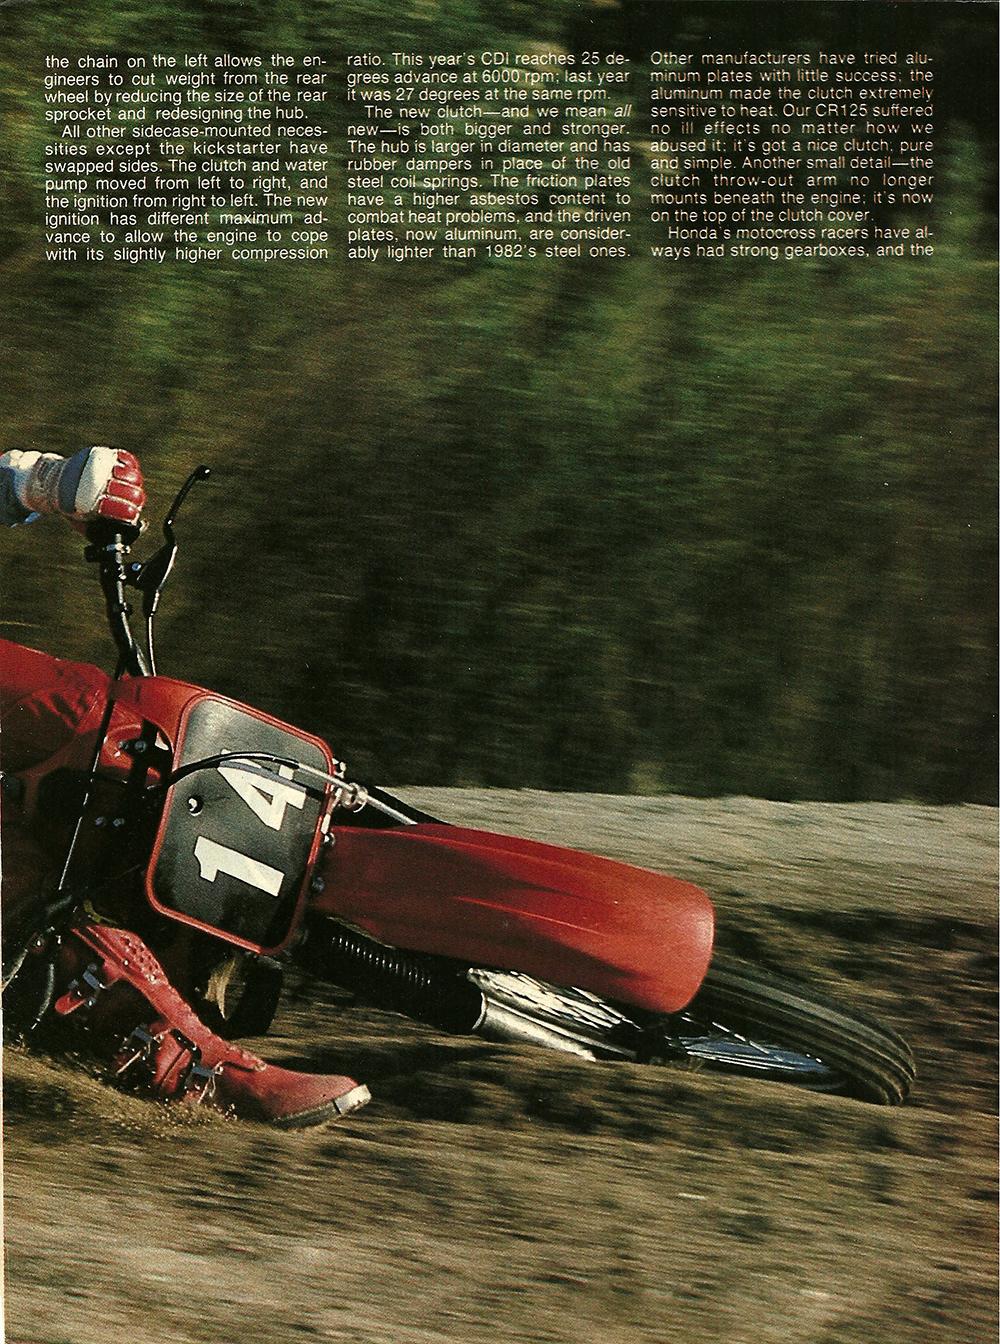 1983 Honda CR125R road test 4.jpg